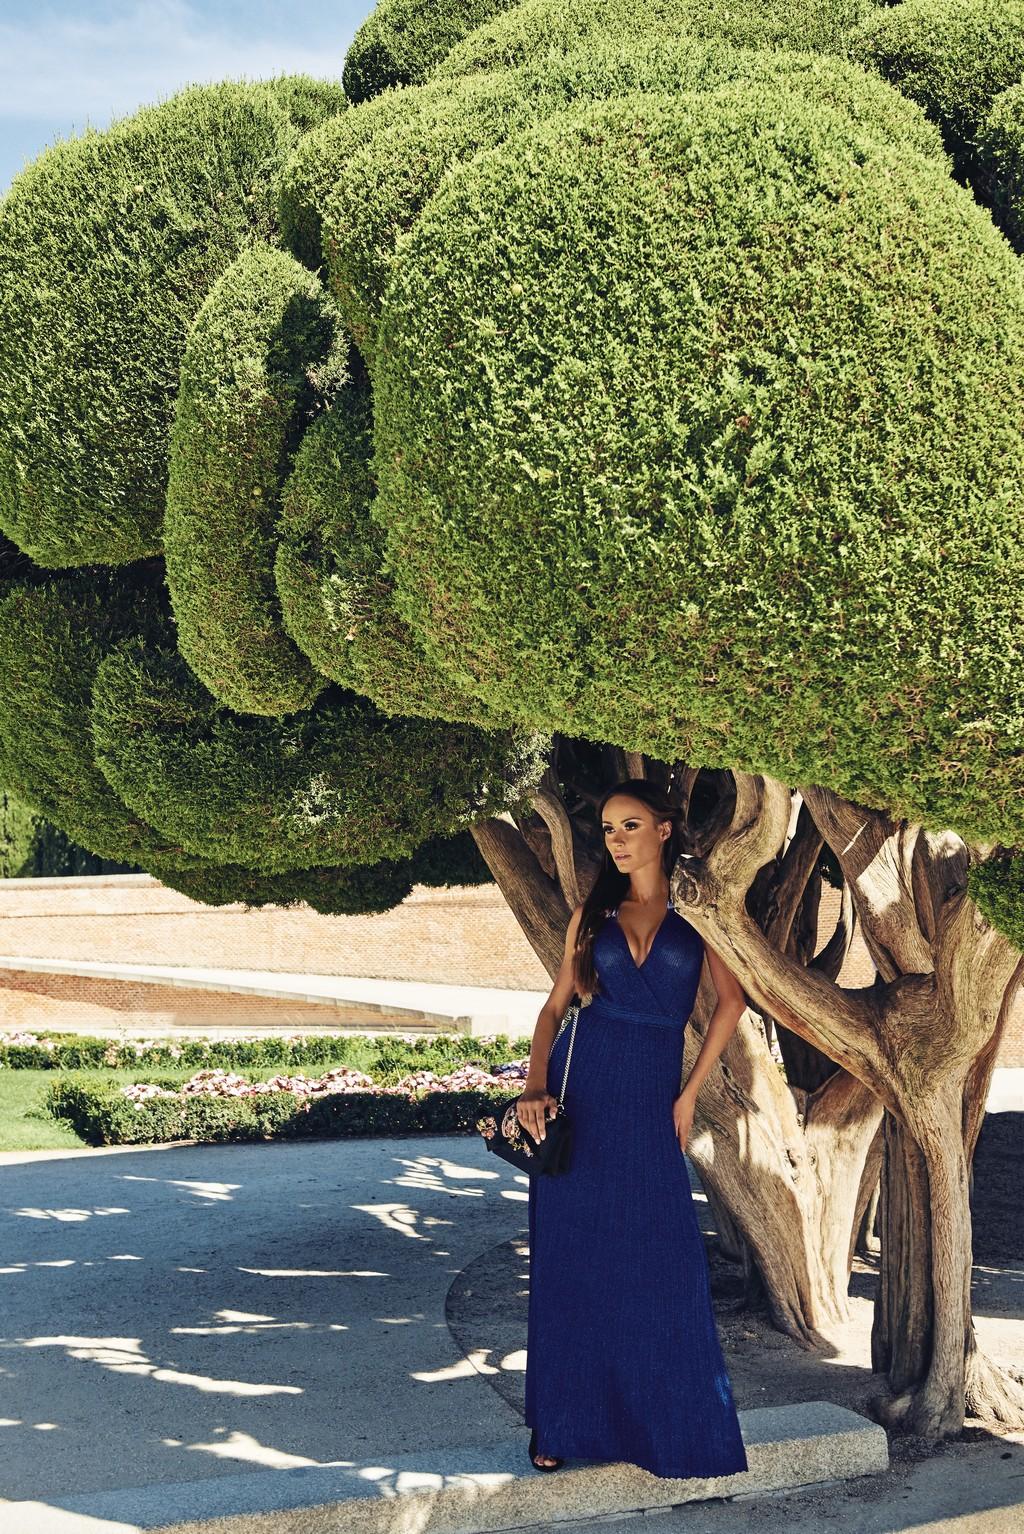 Платье Missoni, сумка N°21 – El Corte Inglés Serrano 47 Woman. Локация: парк Buen Retiro.